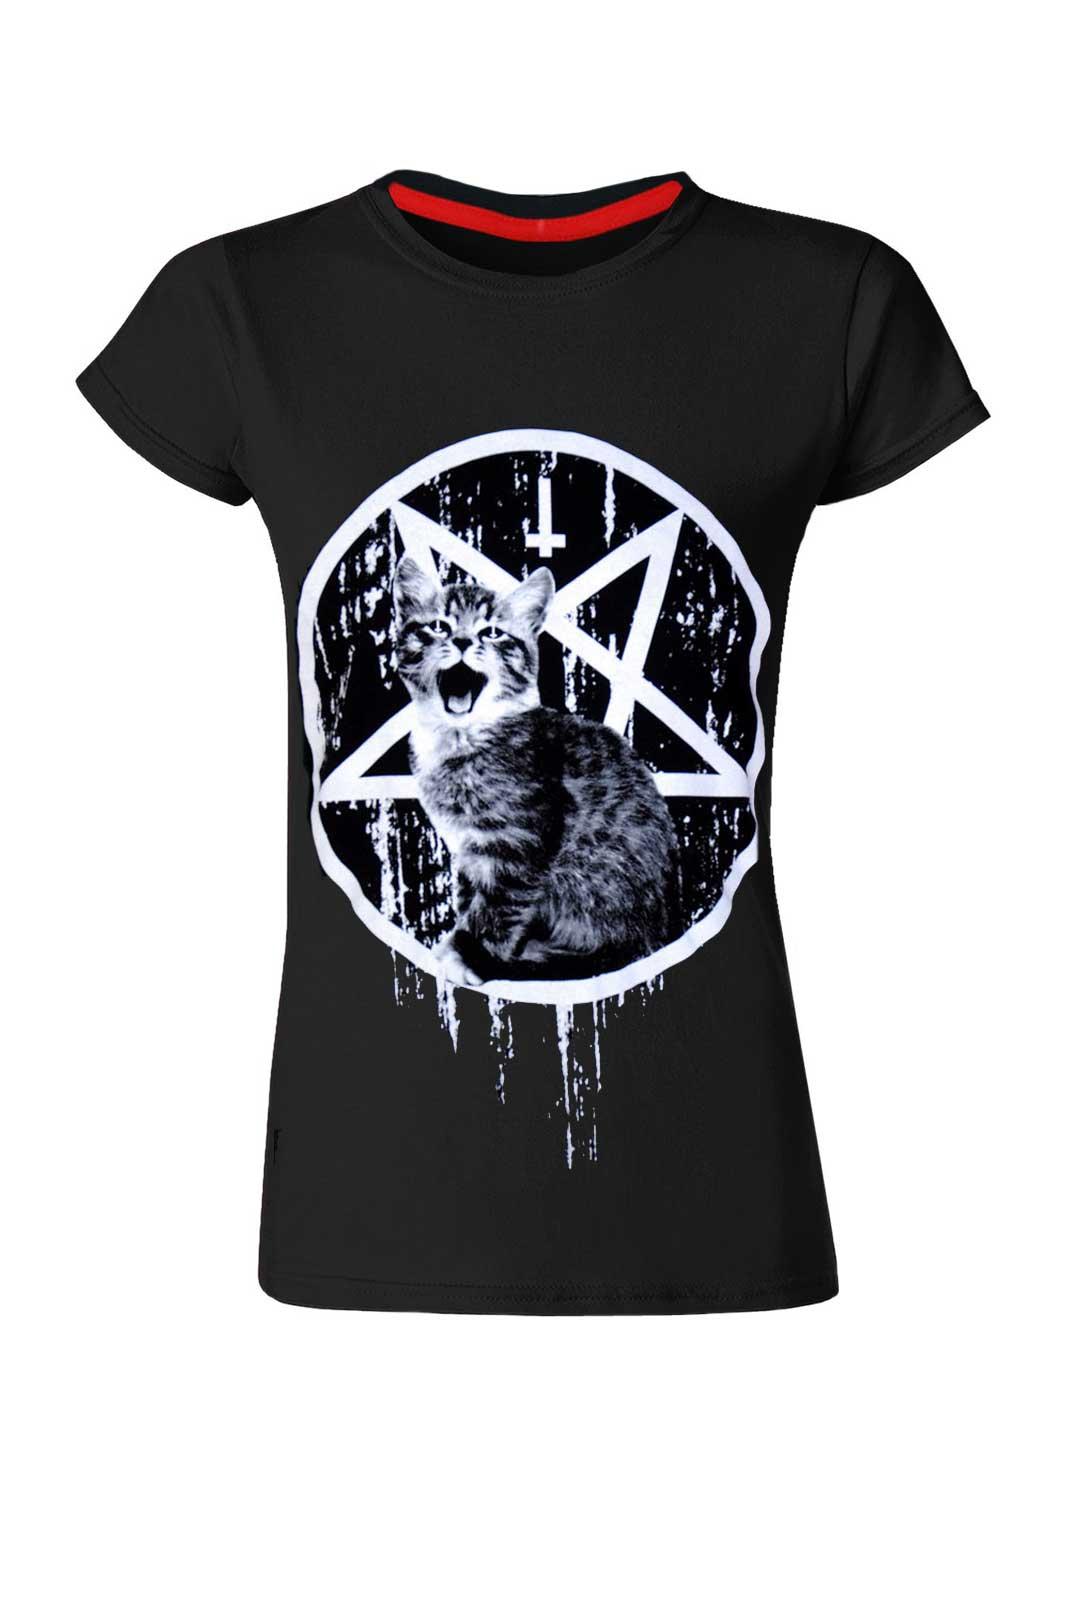 Satans Kitty Ladies Tee Black Darkside